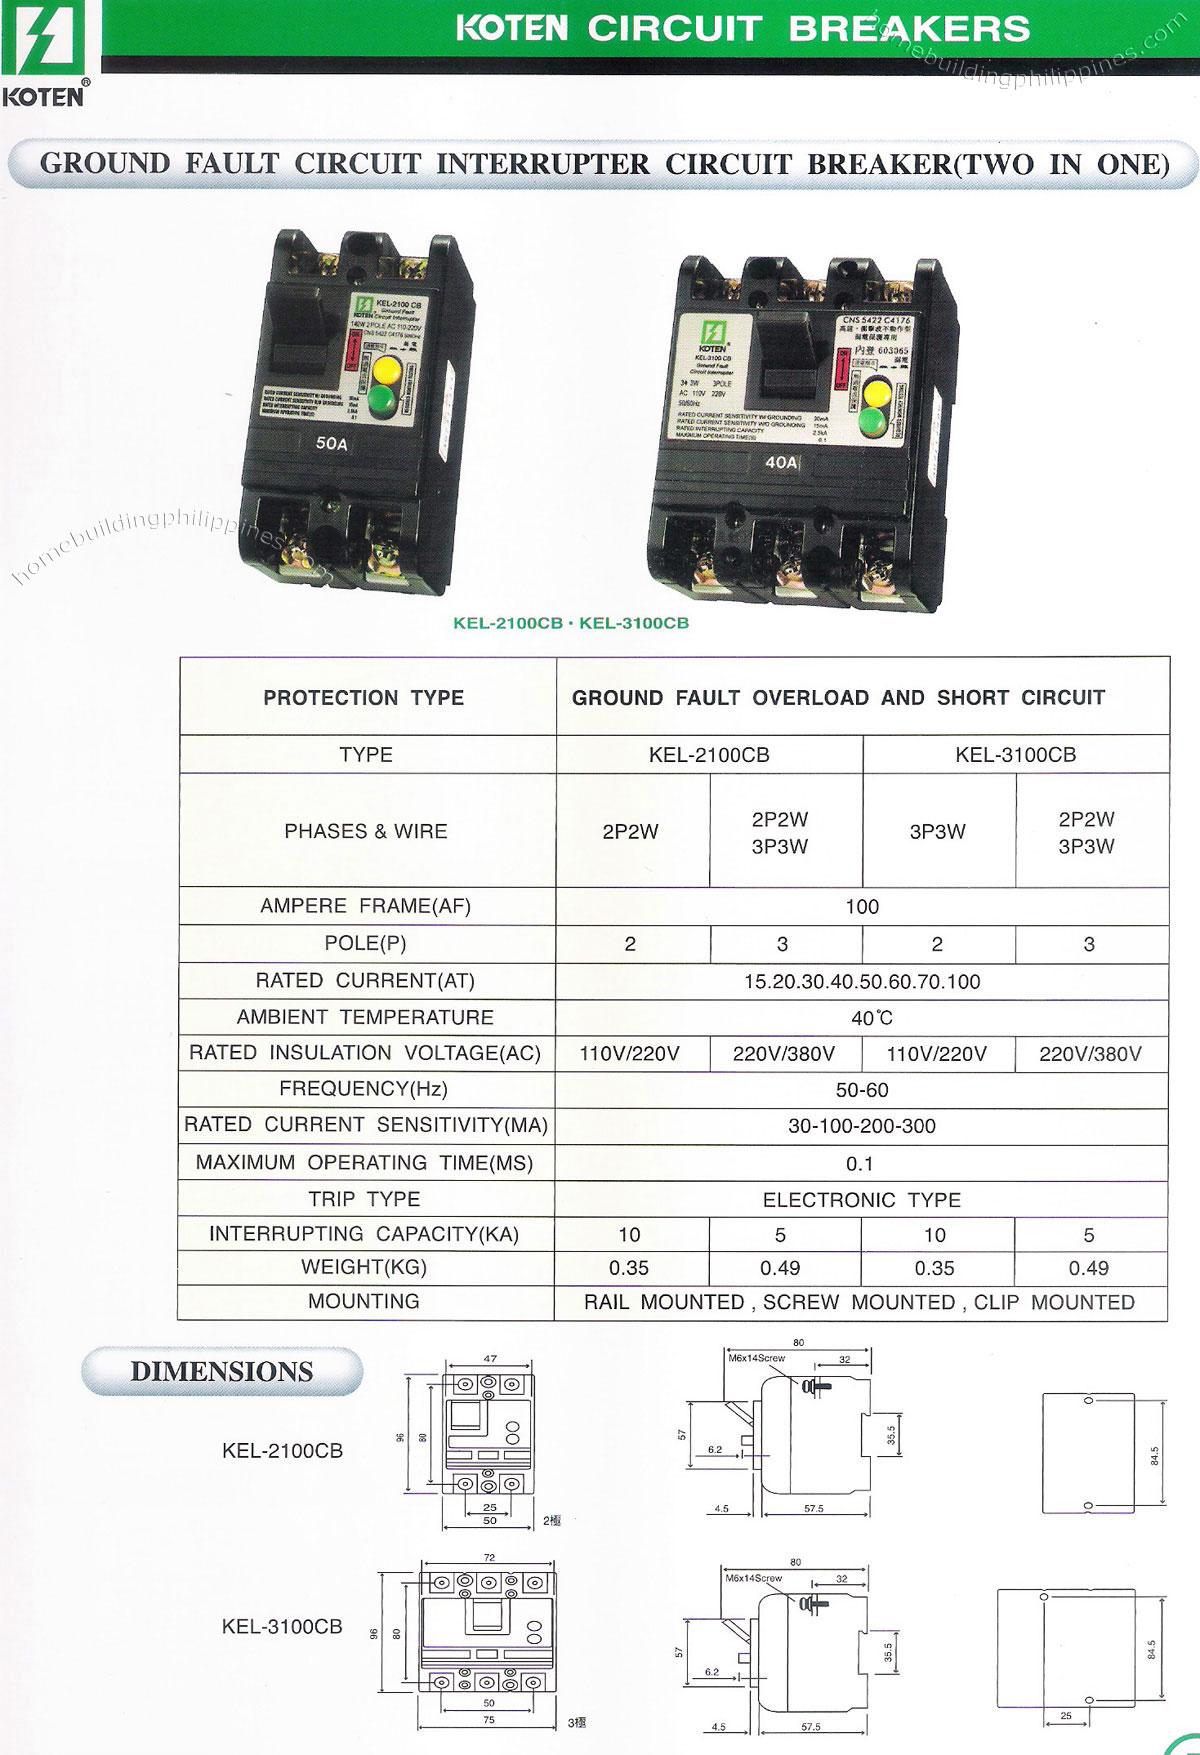 hight resolution of koten ground fault circuit interrupter circuit breaker koten ground fault circuit interrupter circuit breaker